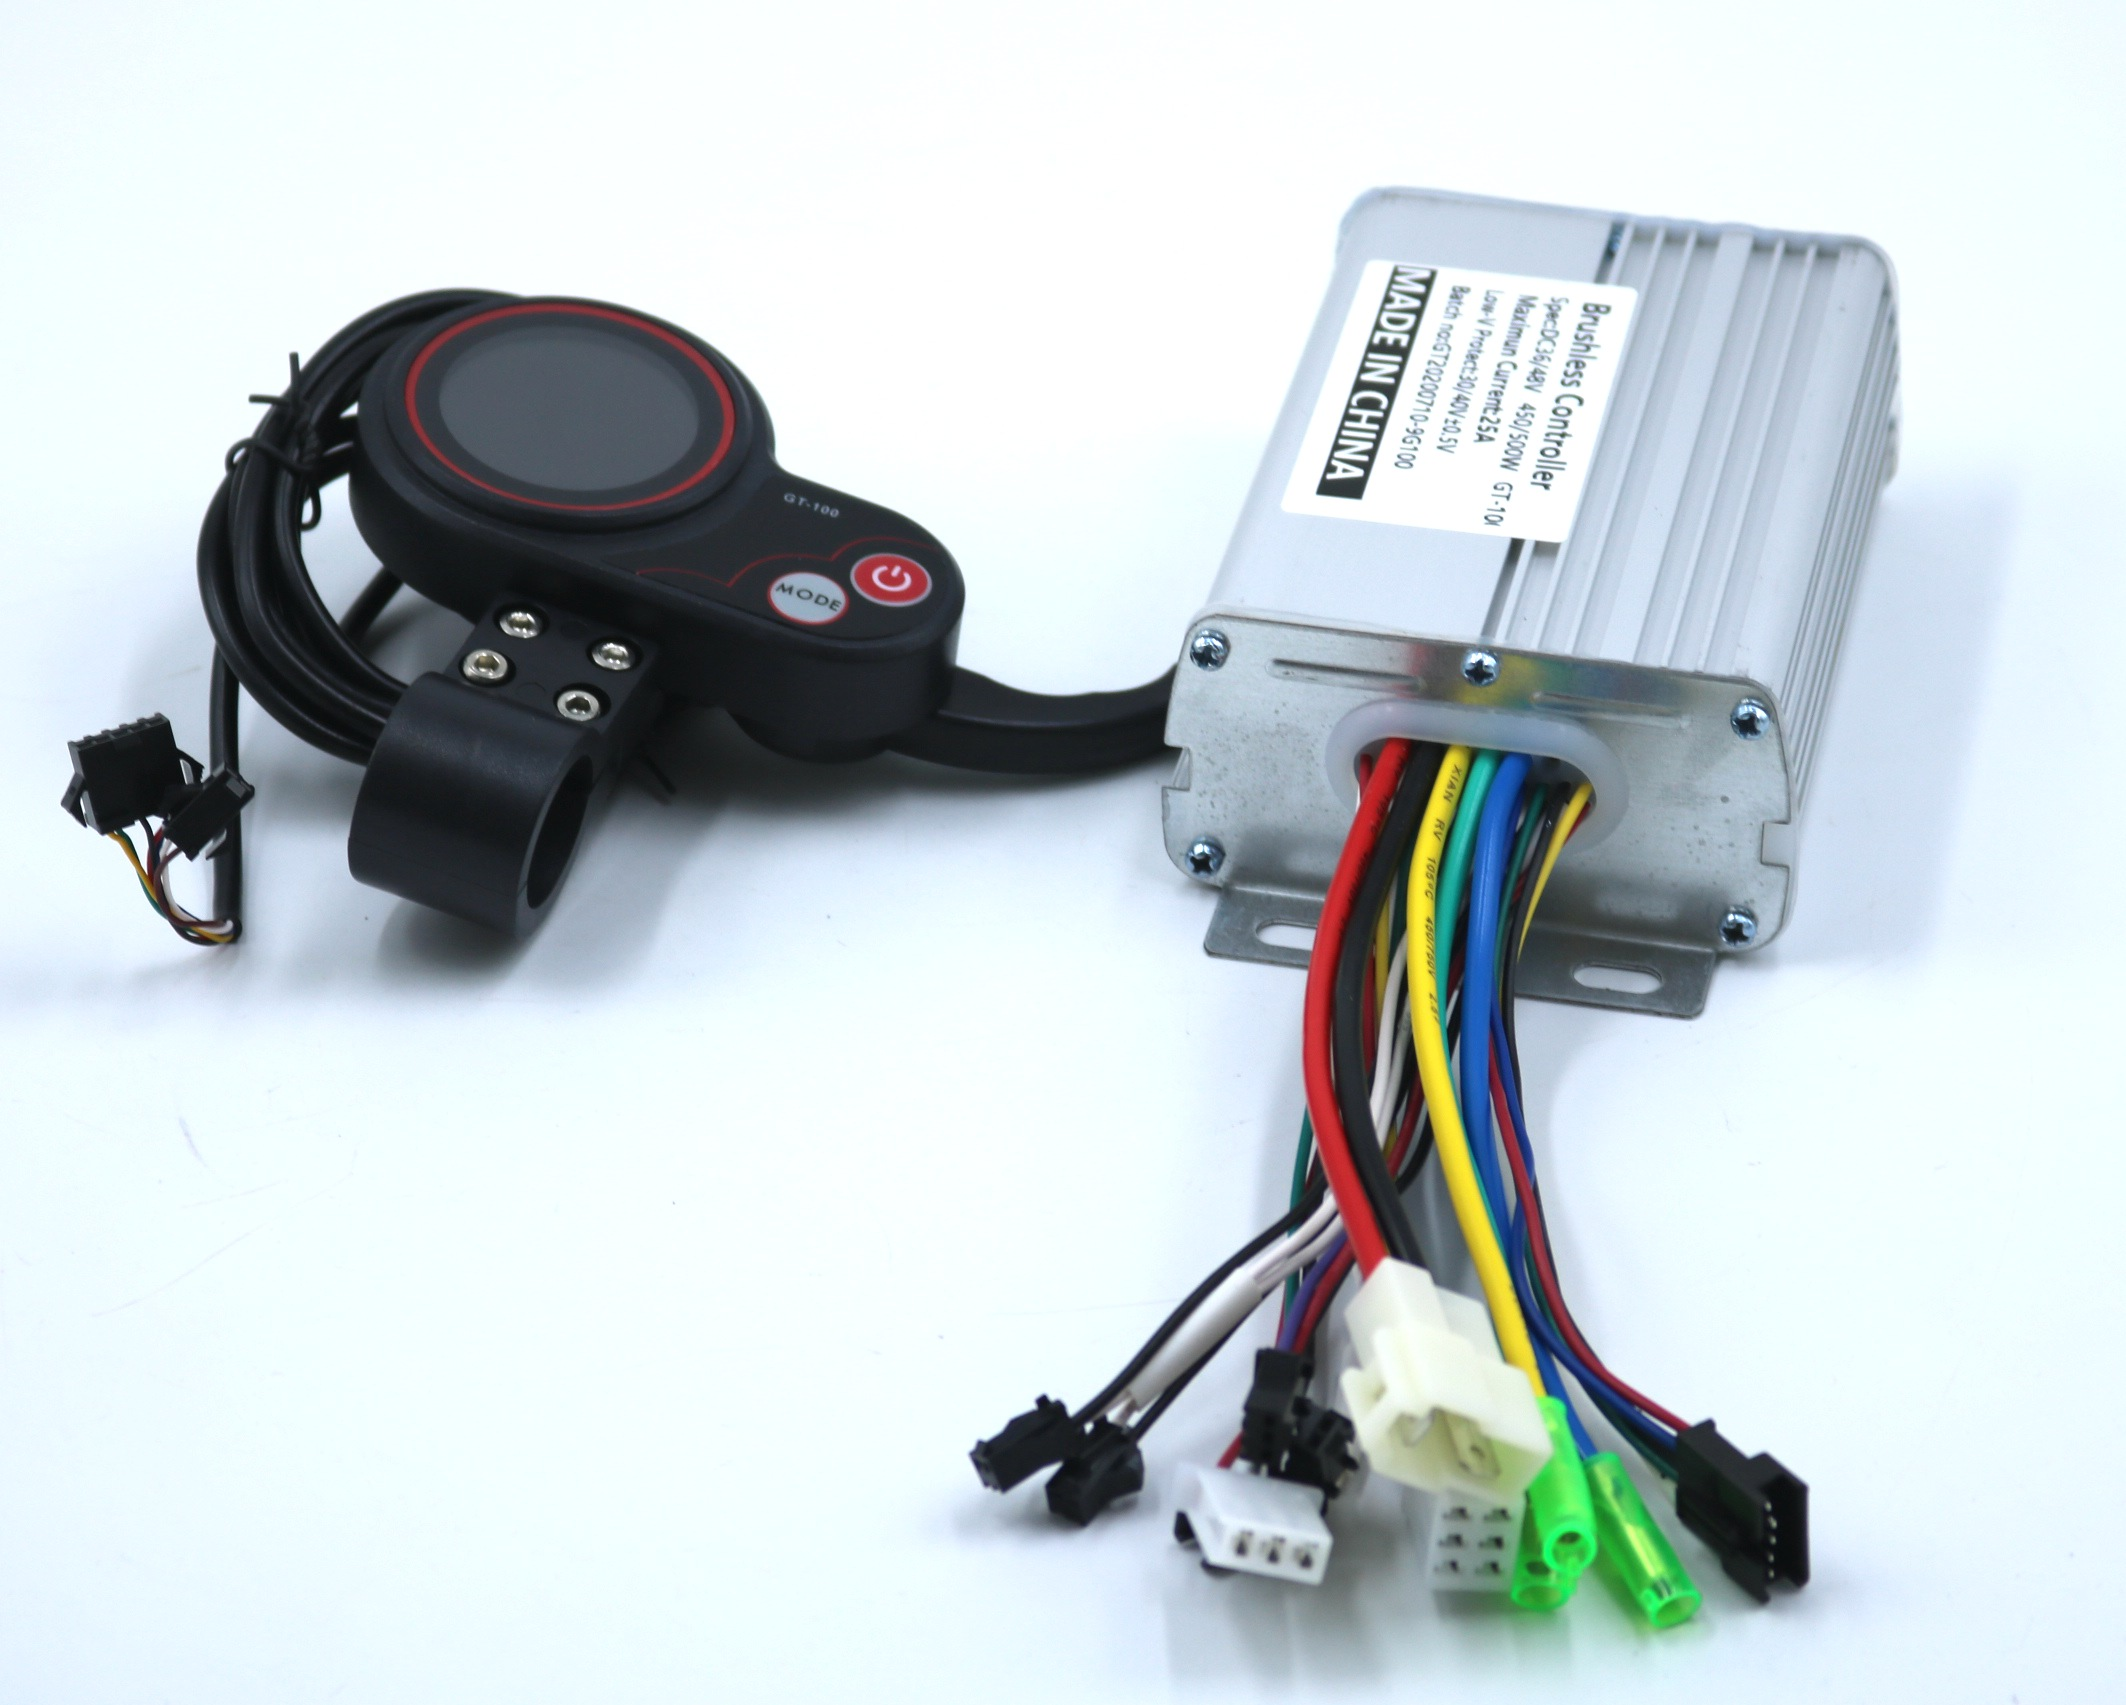 GREENTIME 36 فولت/48 فولت 500 واط 25A BLDC سكوتر كهربائي تحكم E-الدراجة فرش سرعة سائق و GT-100 شاشة الكريستال السائل مجموعة واحدة